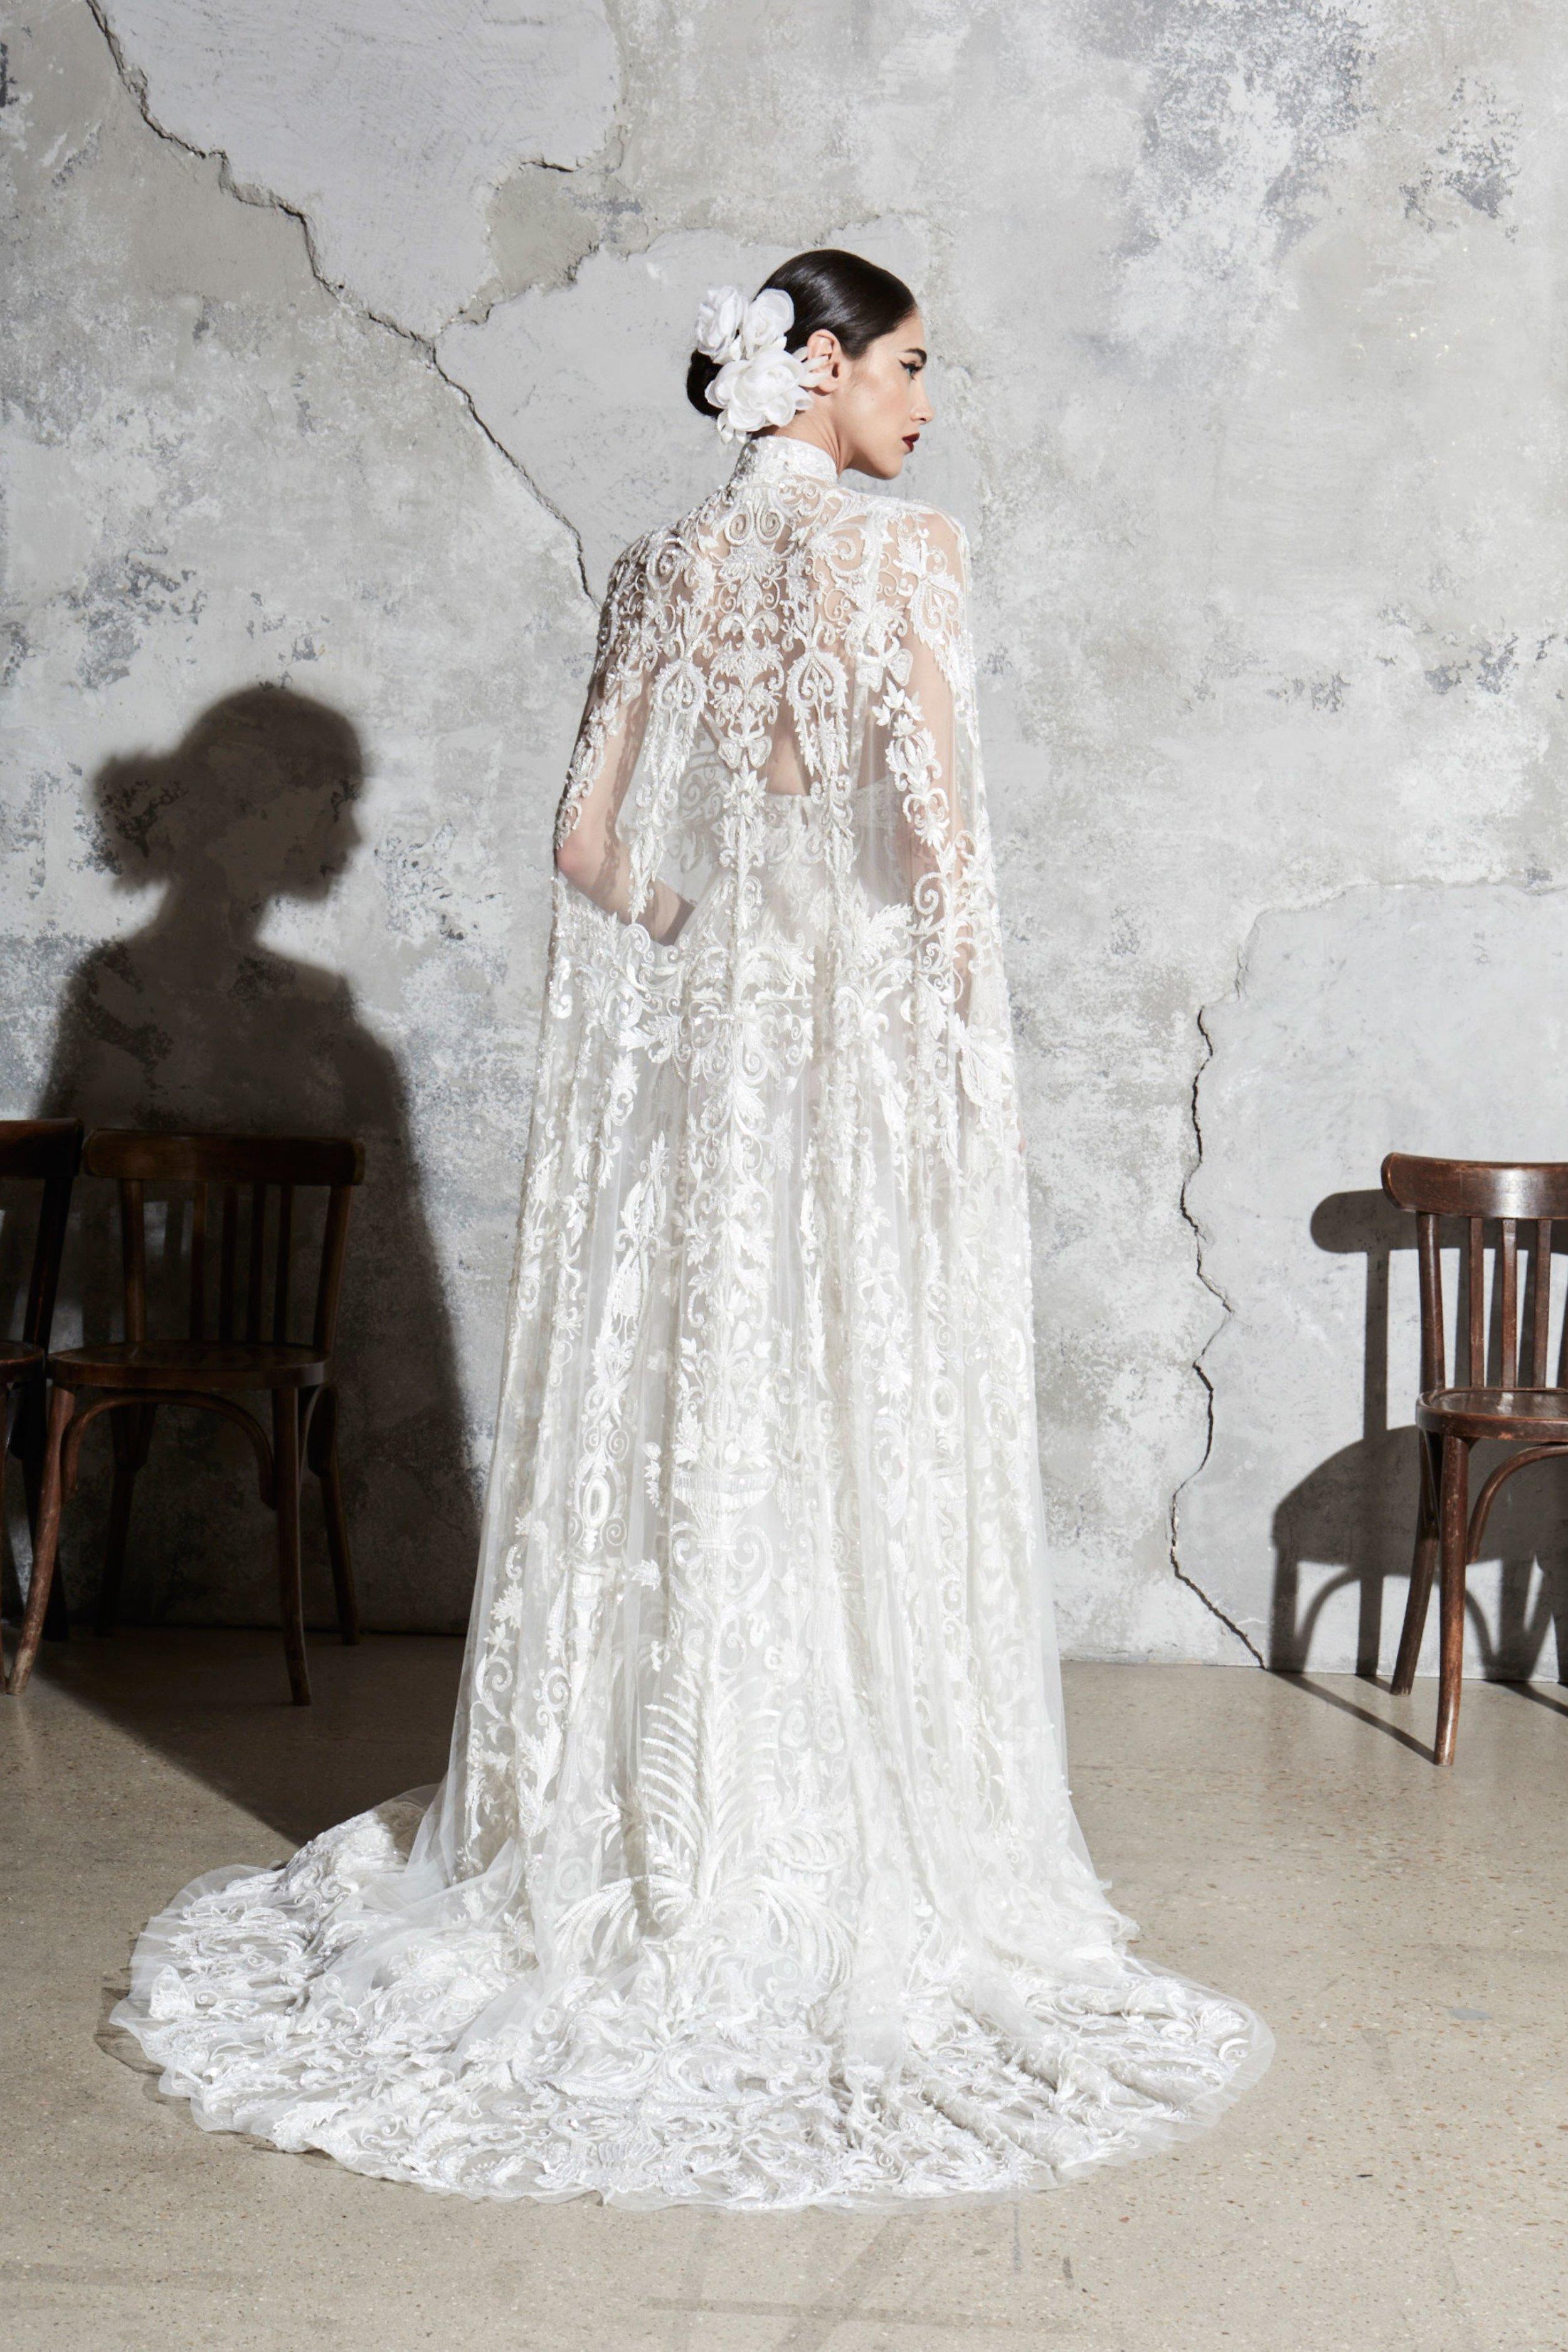 00009-zuhair-murad-new-york-bridal-Spring-2020-CREDIT-Thomas-Nutzl.jpg